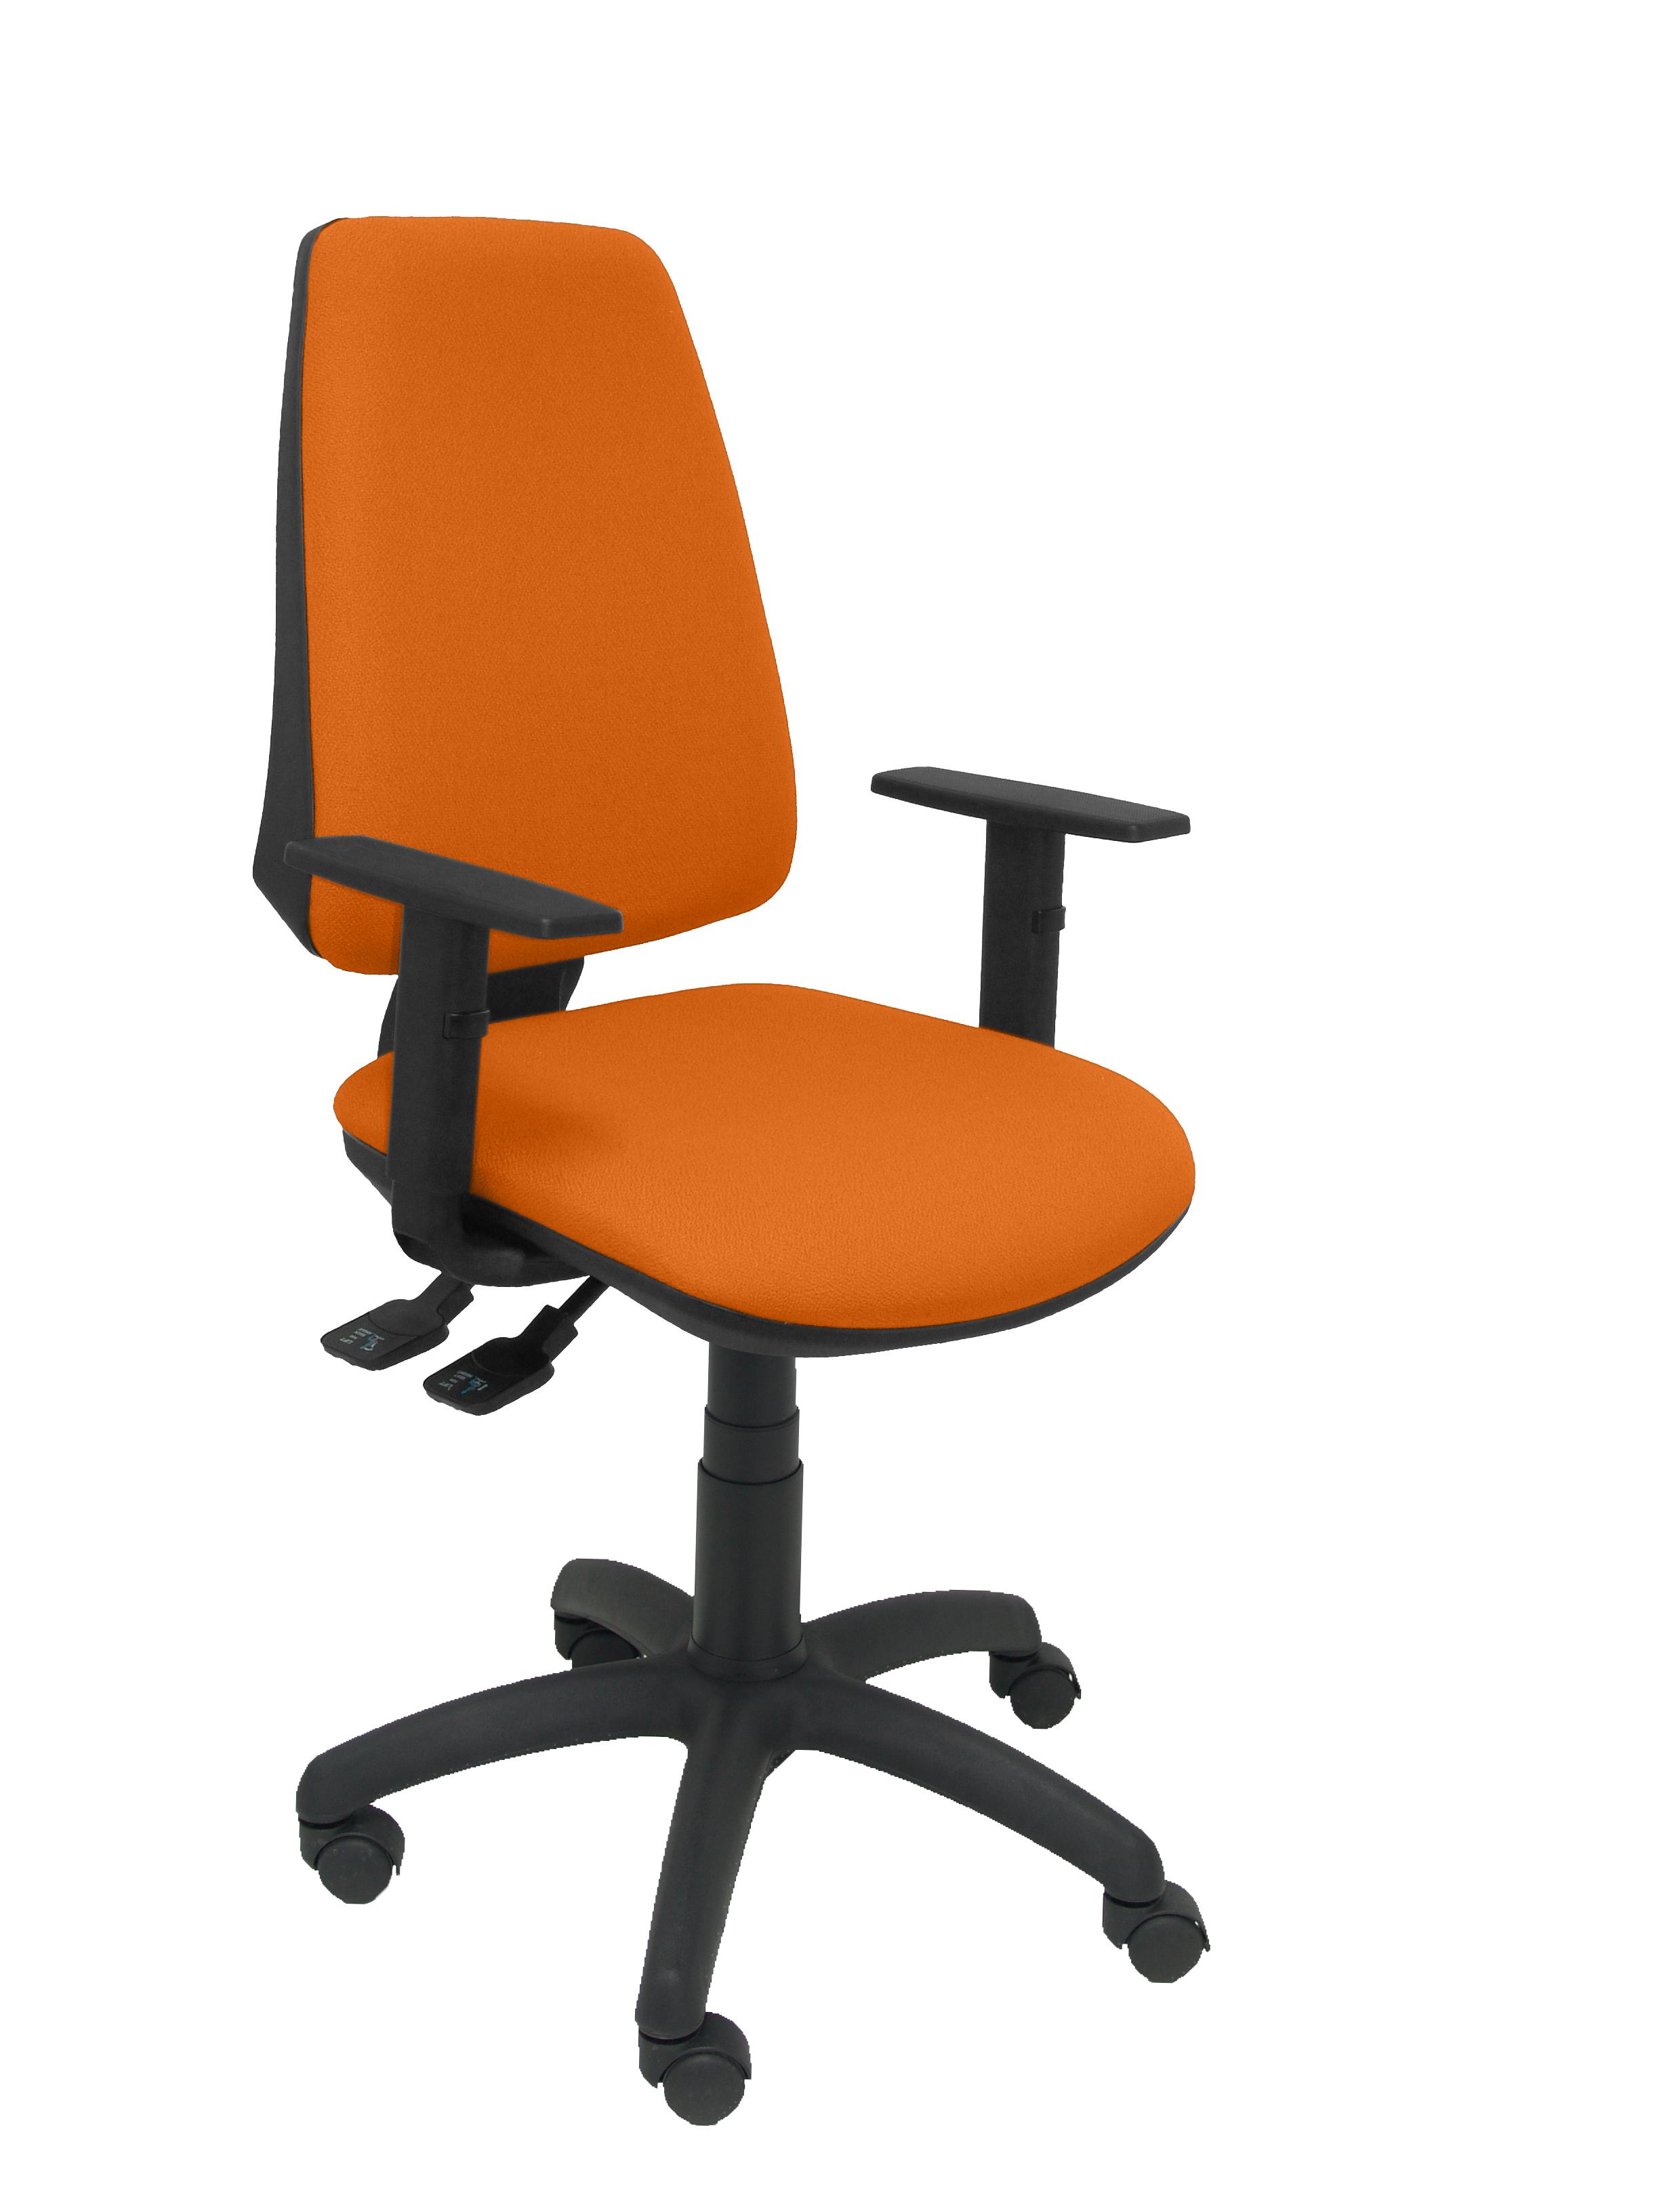 Silla Elche S bali naranja brazos regulables